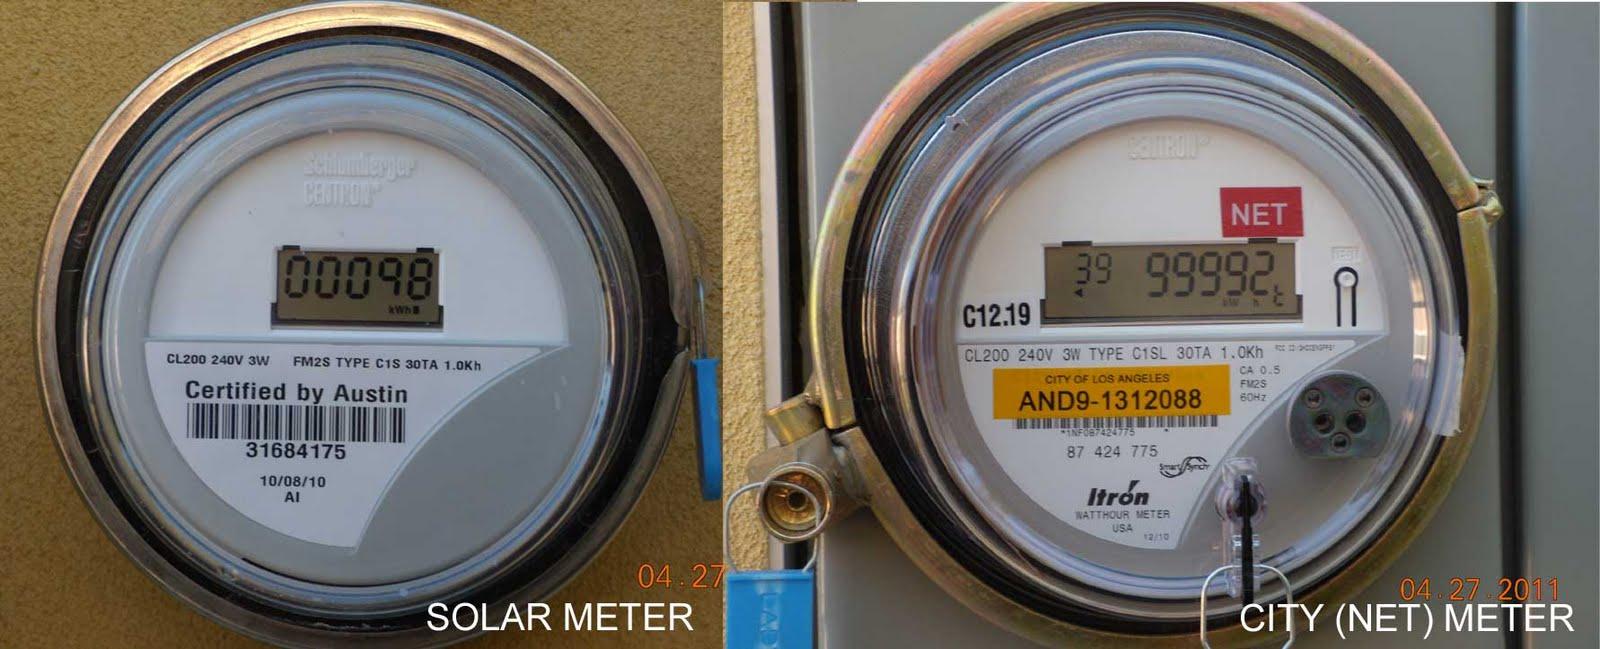 nobhillhaus: Net Metering